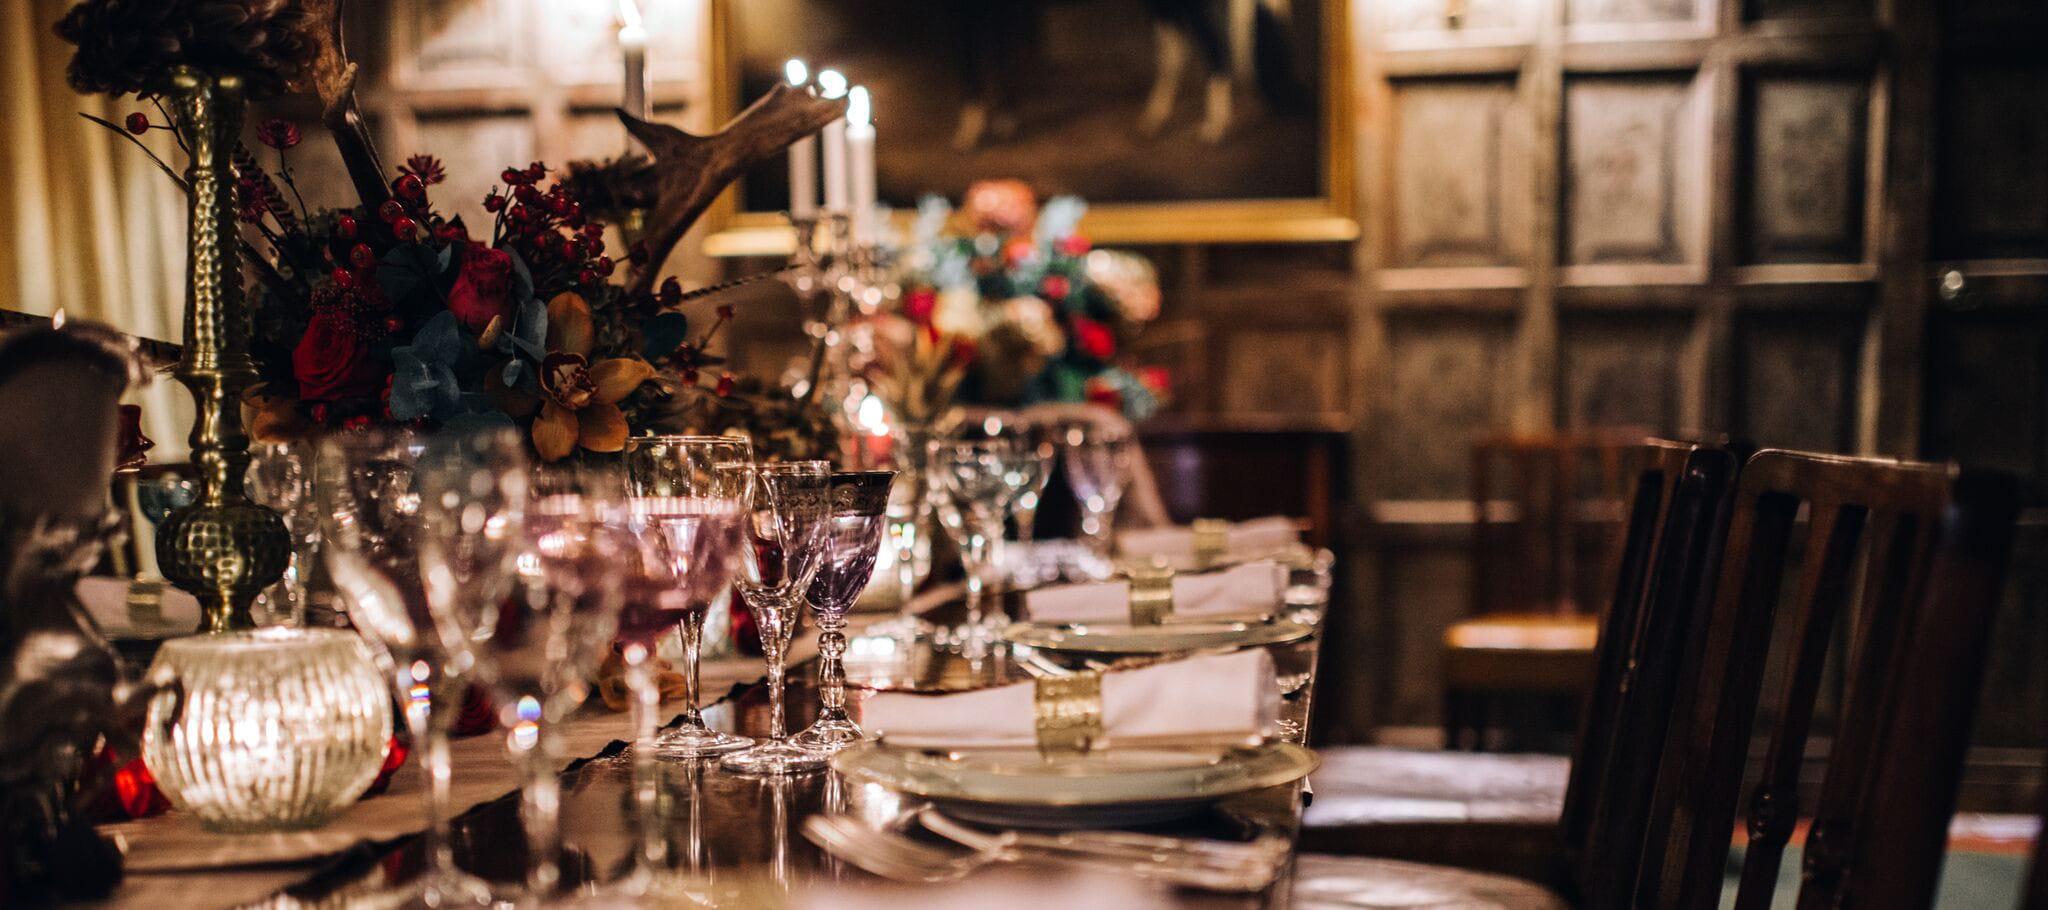 Cornwell-Manor-Dining-Room